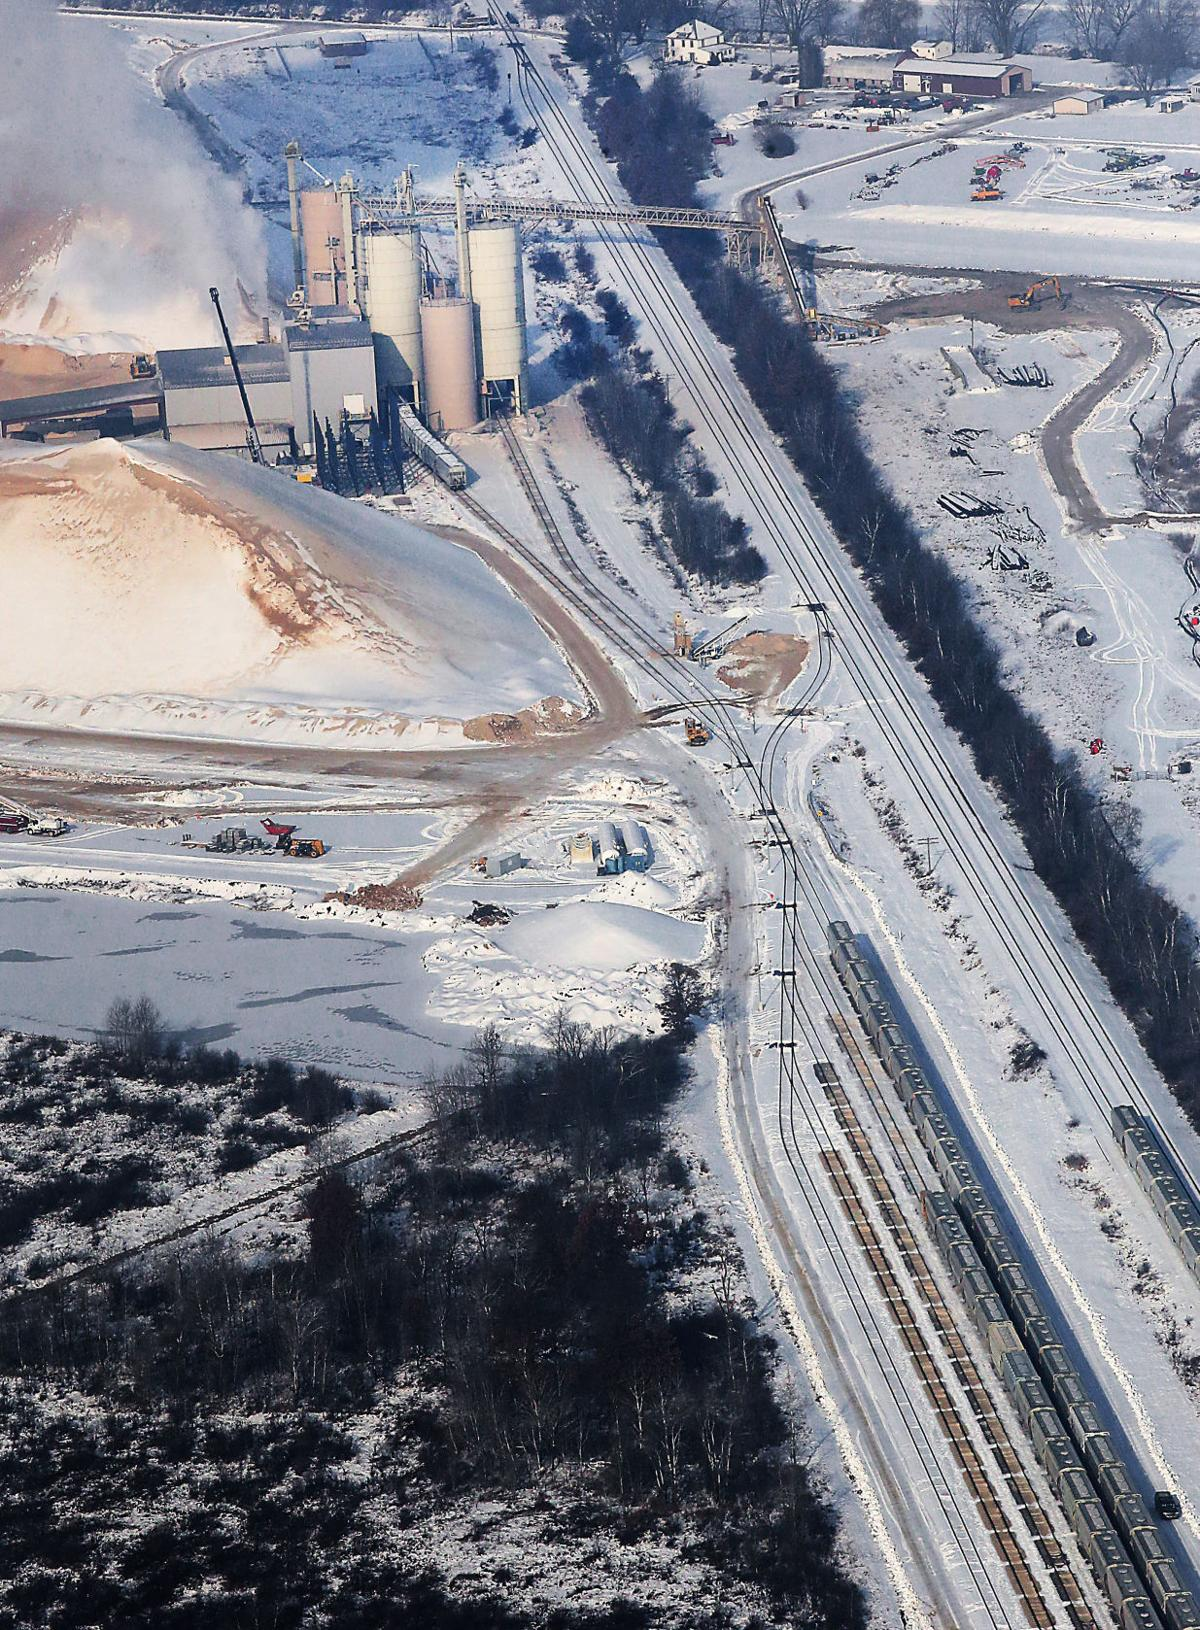 Frac sand producers spent millions on now underused rail yards